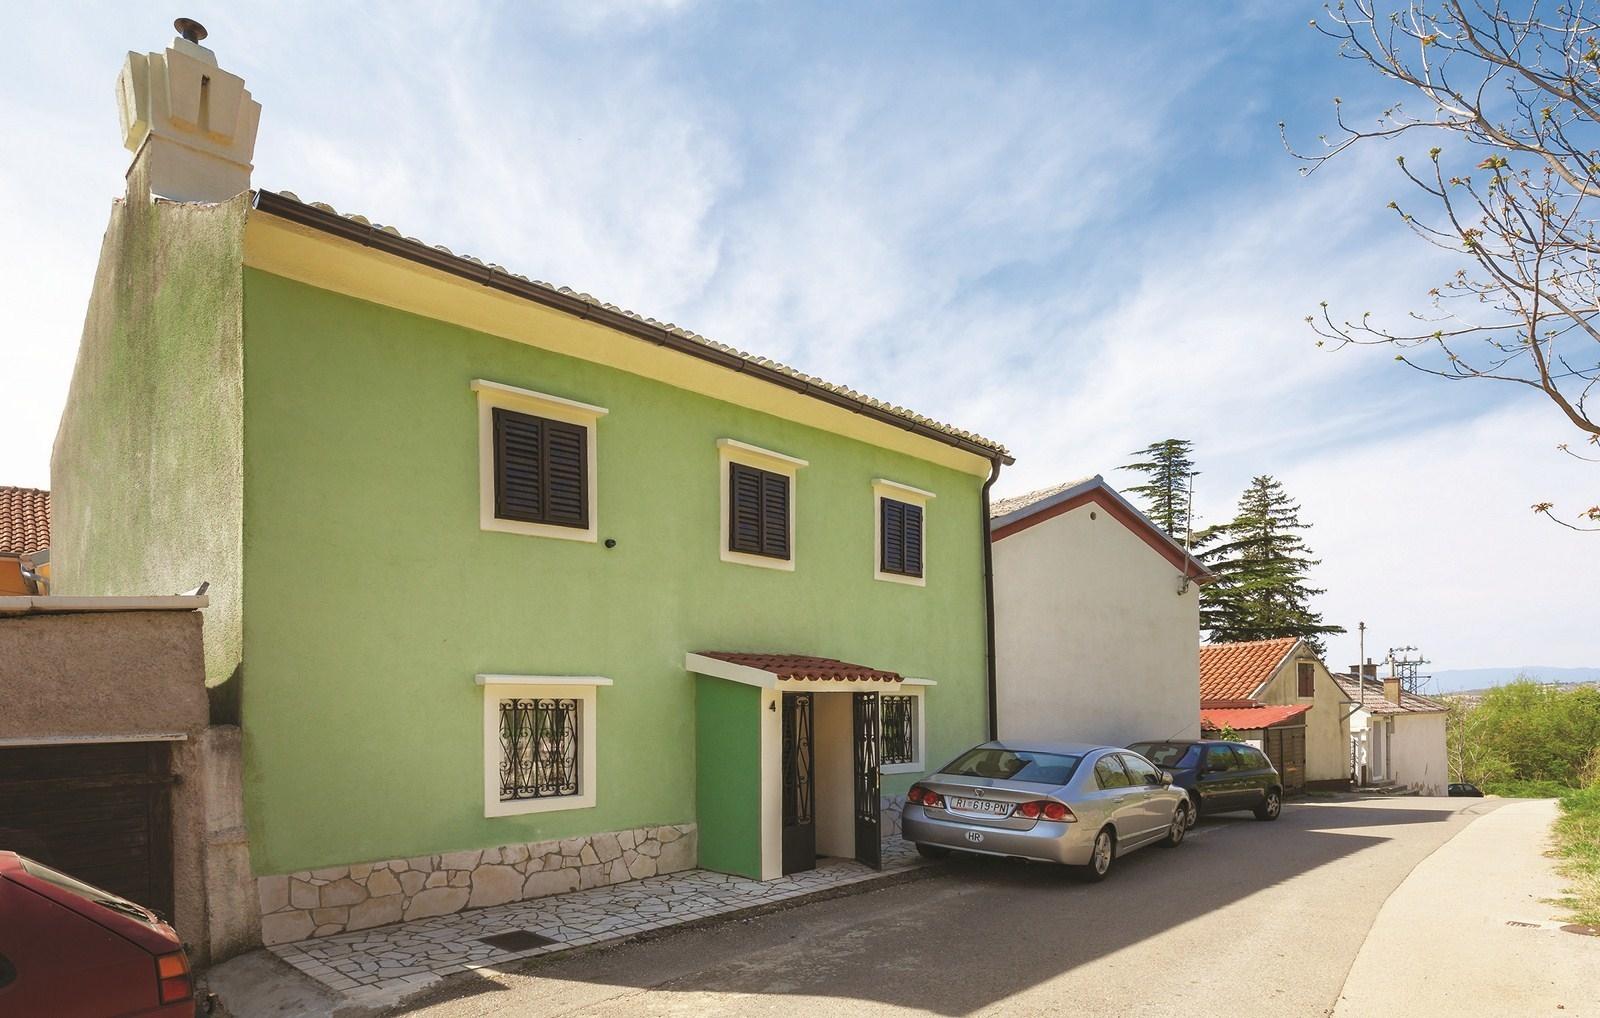 Stone House - Bakarac - Vakantiehuizen, villa´s Kroatië